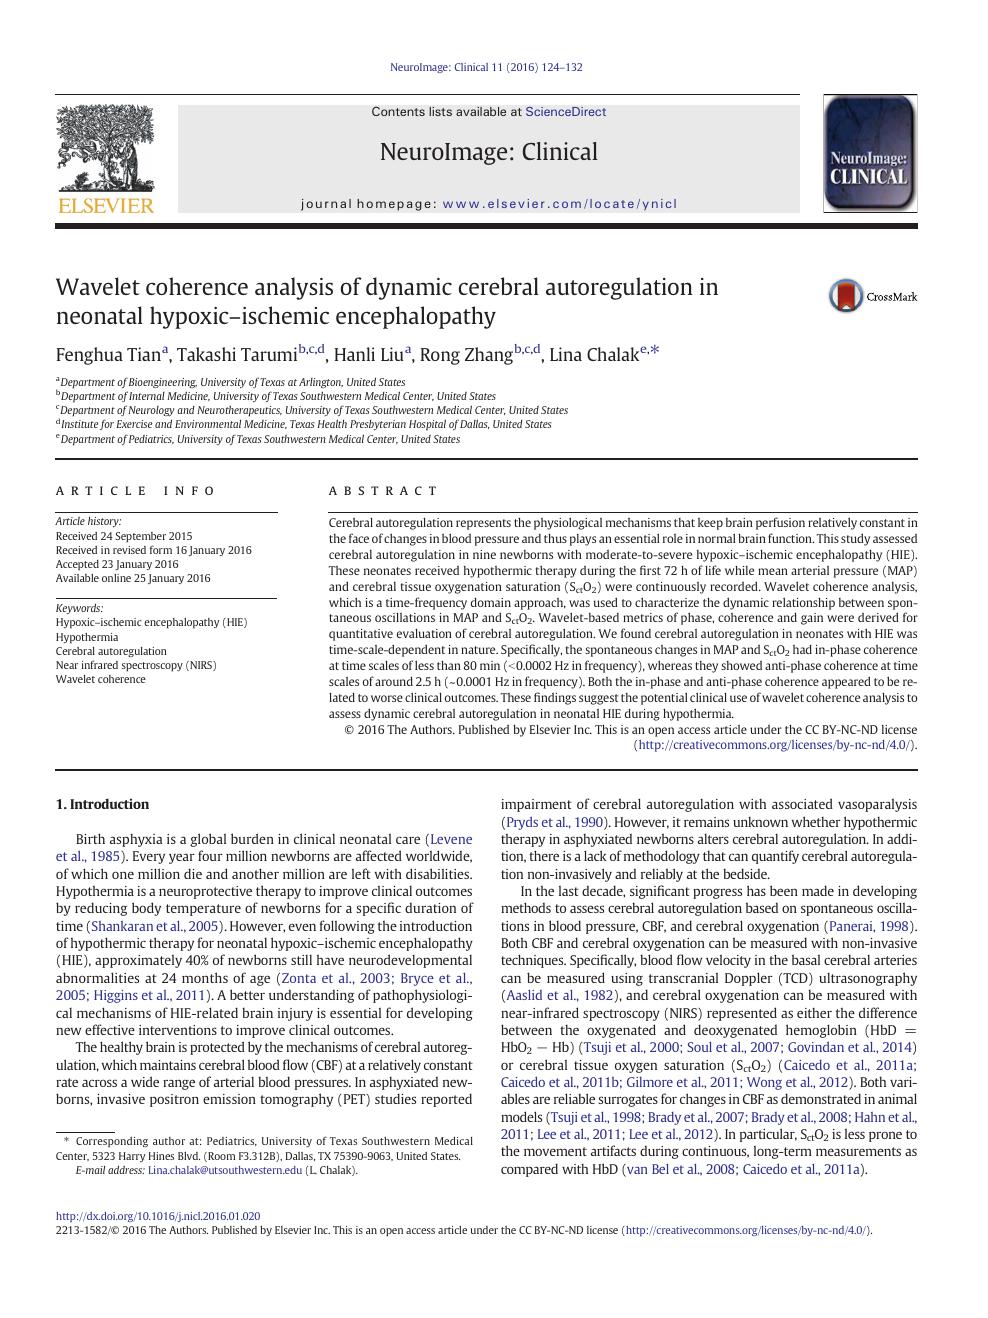 Wavelet coherence analysis of dynamic cerebral